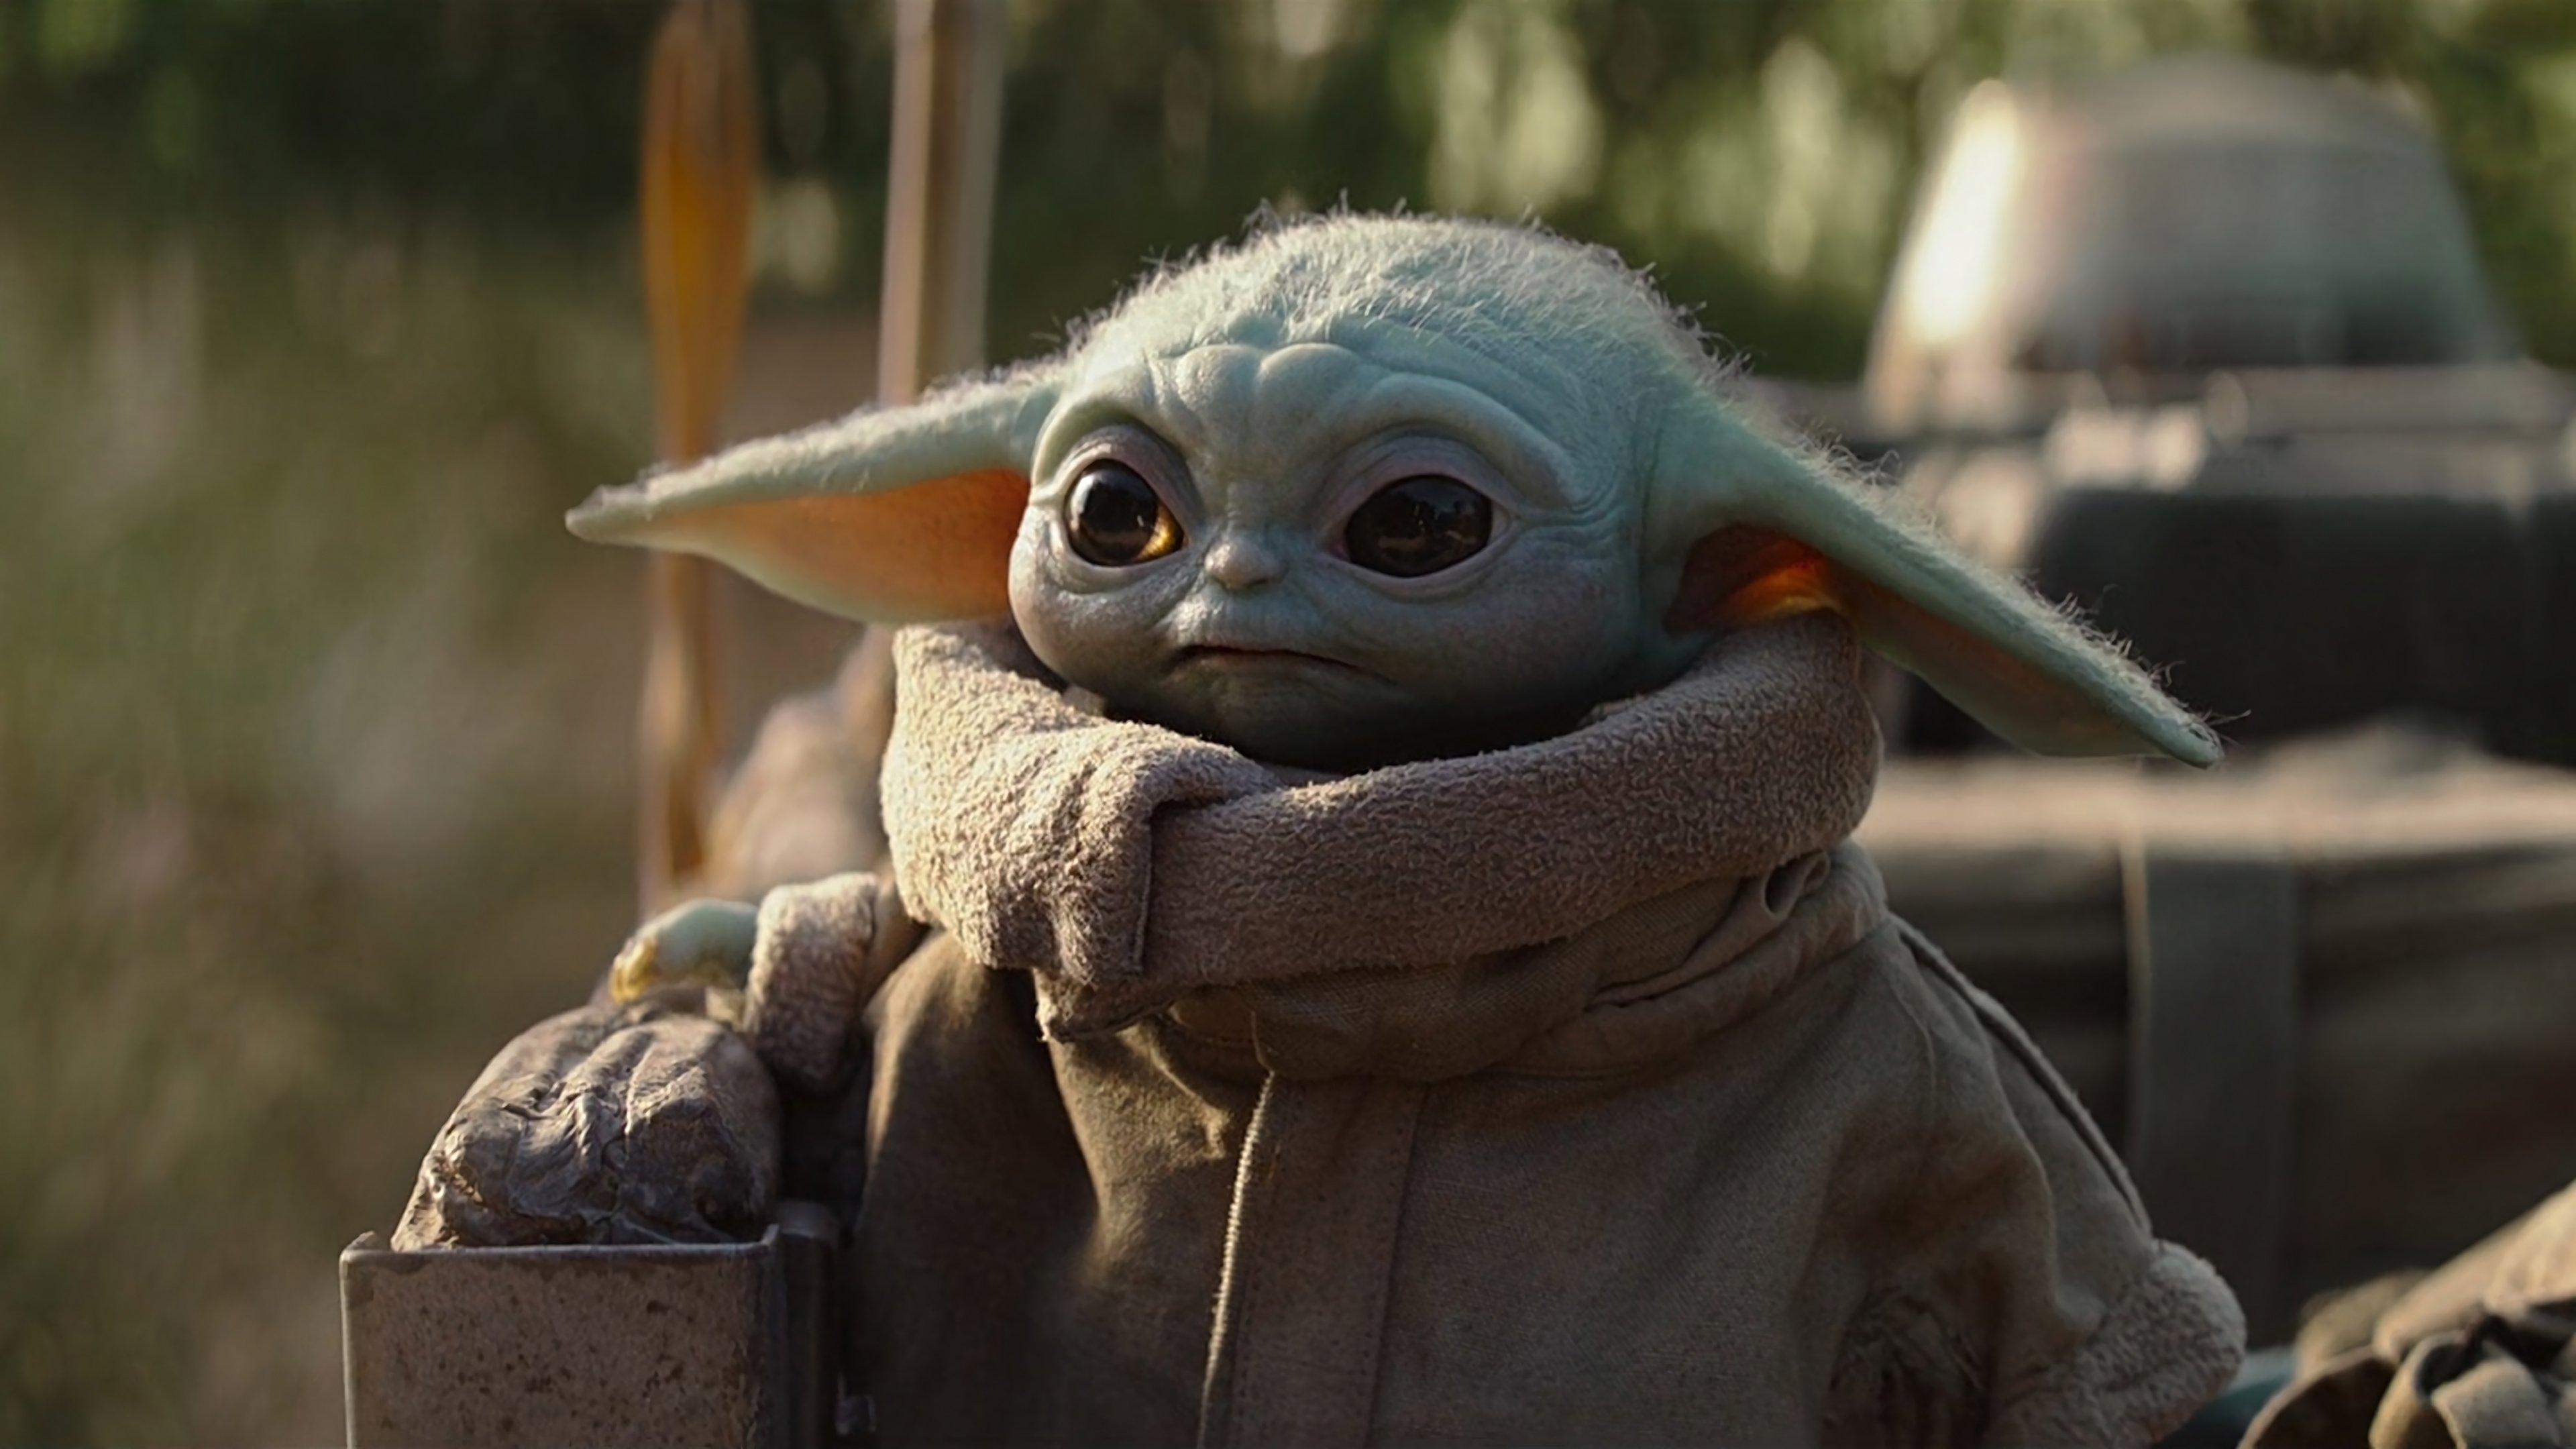 Baby Yoda from The Mandalorian Wallpaper 4k Ultra HD ID:4404